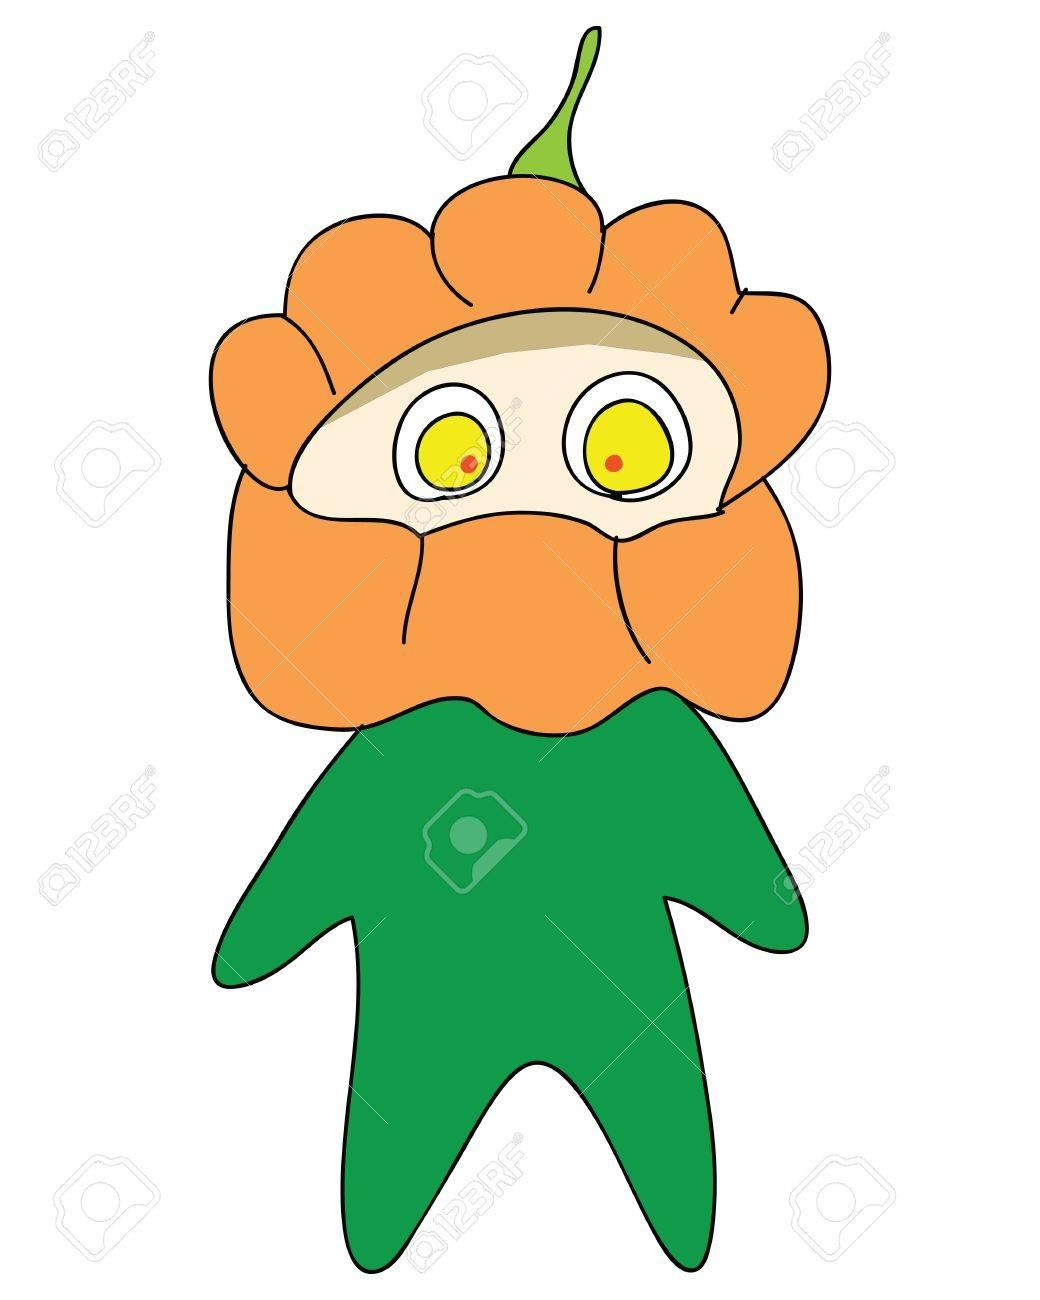 halloween monster cartoon charactor hand drawn illustration Stock Vector - 15965124